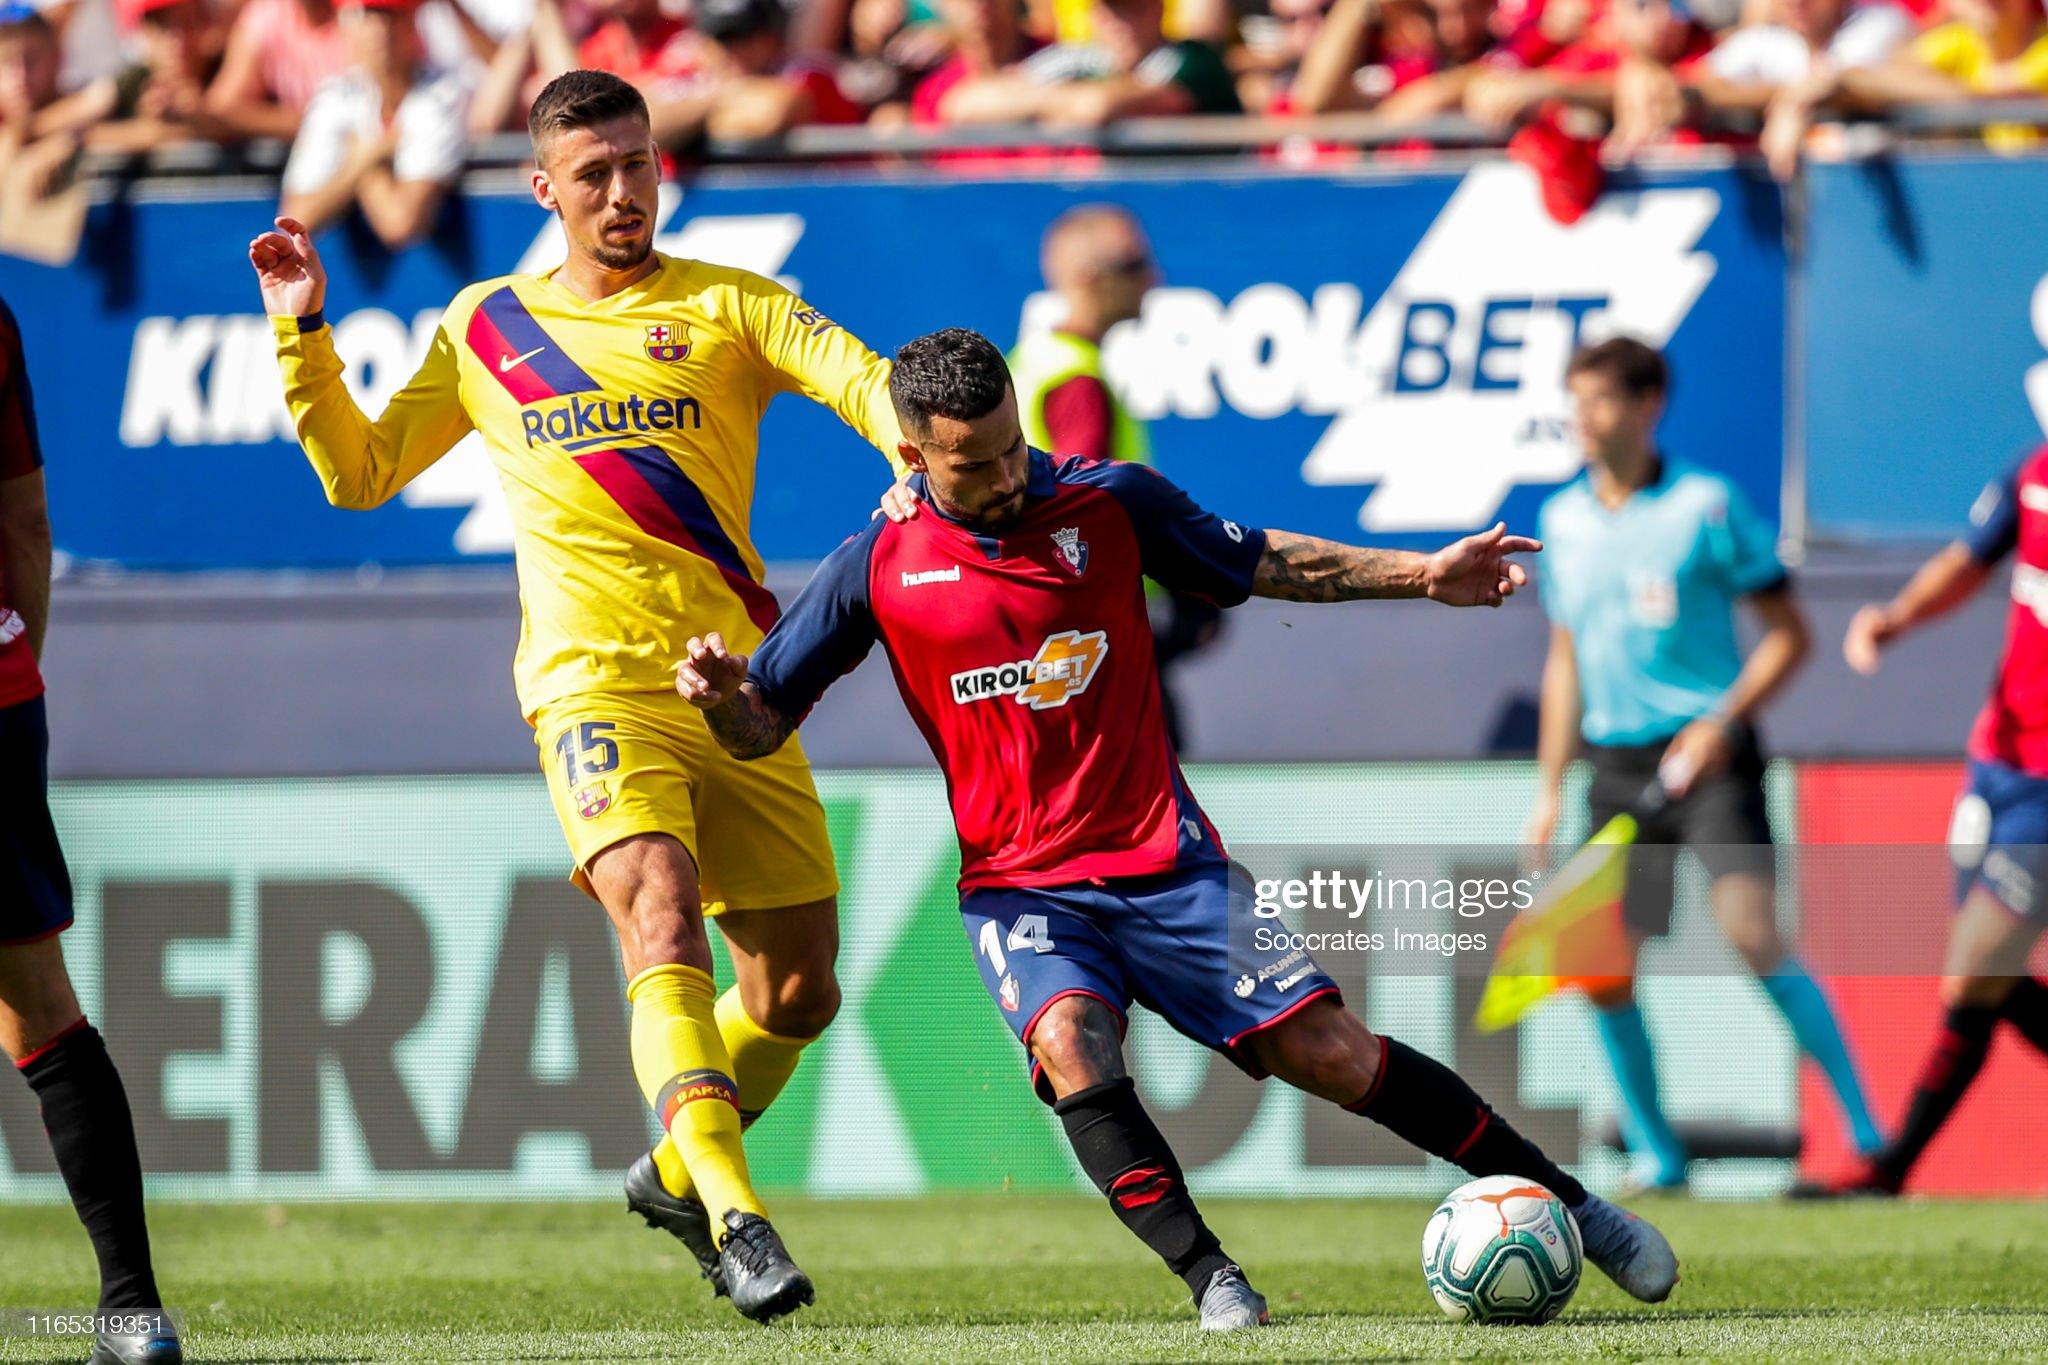 صور مباراة : أوساسونا - برشلونة 2-2 ( 31-08-2019 )  Clement-lenglet-of-fc-barcelona-ruben-garcia-of-ca-osasuna-during-the-picture-id1165319351?s=2048x2048